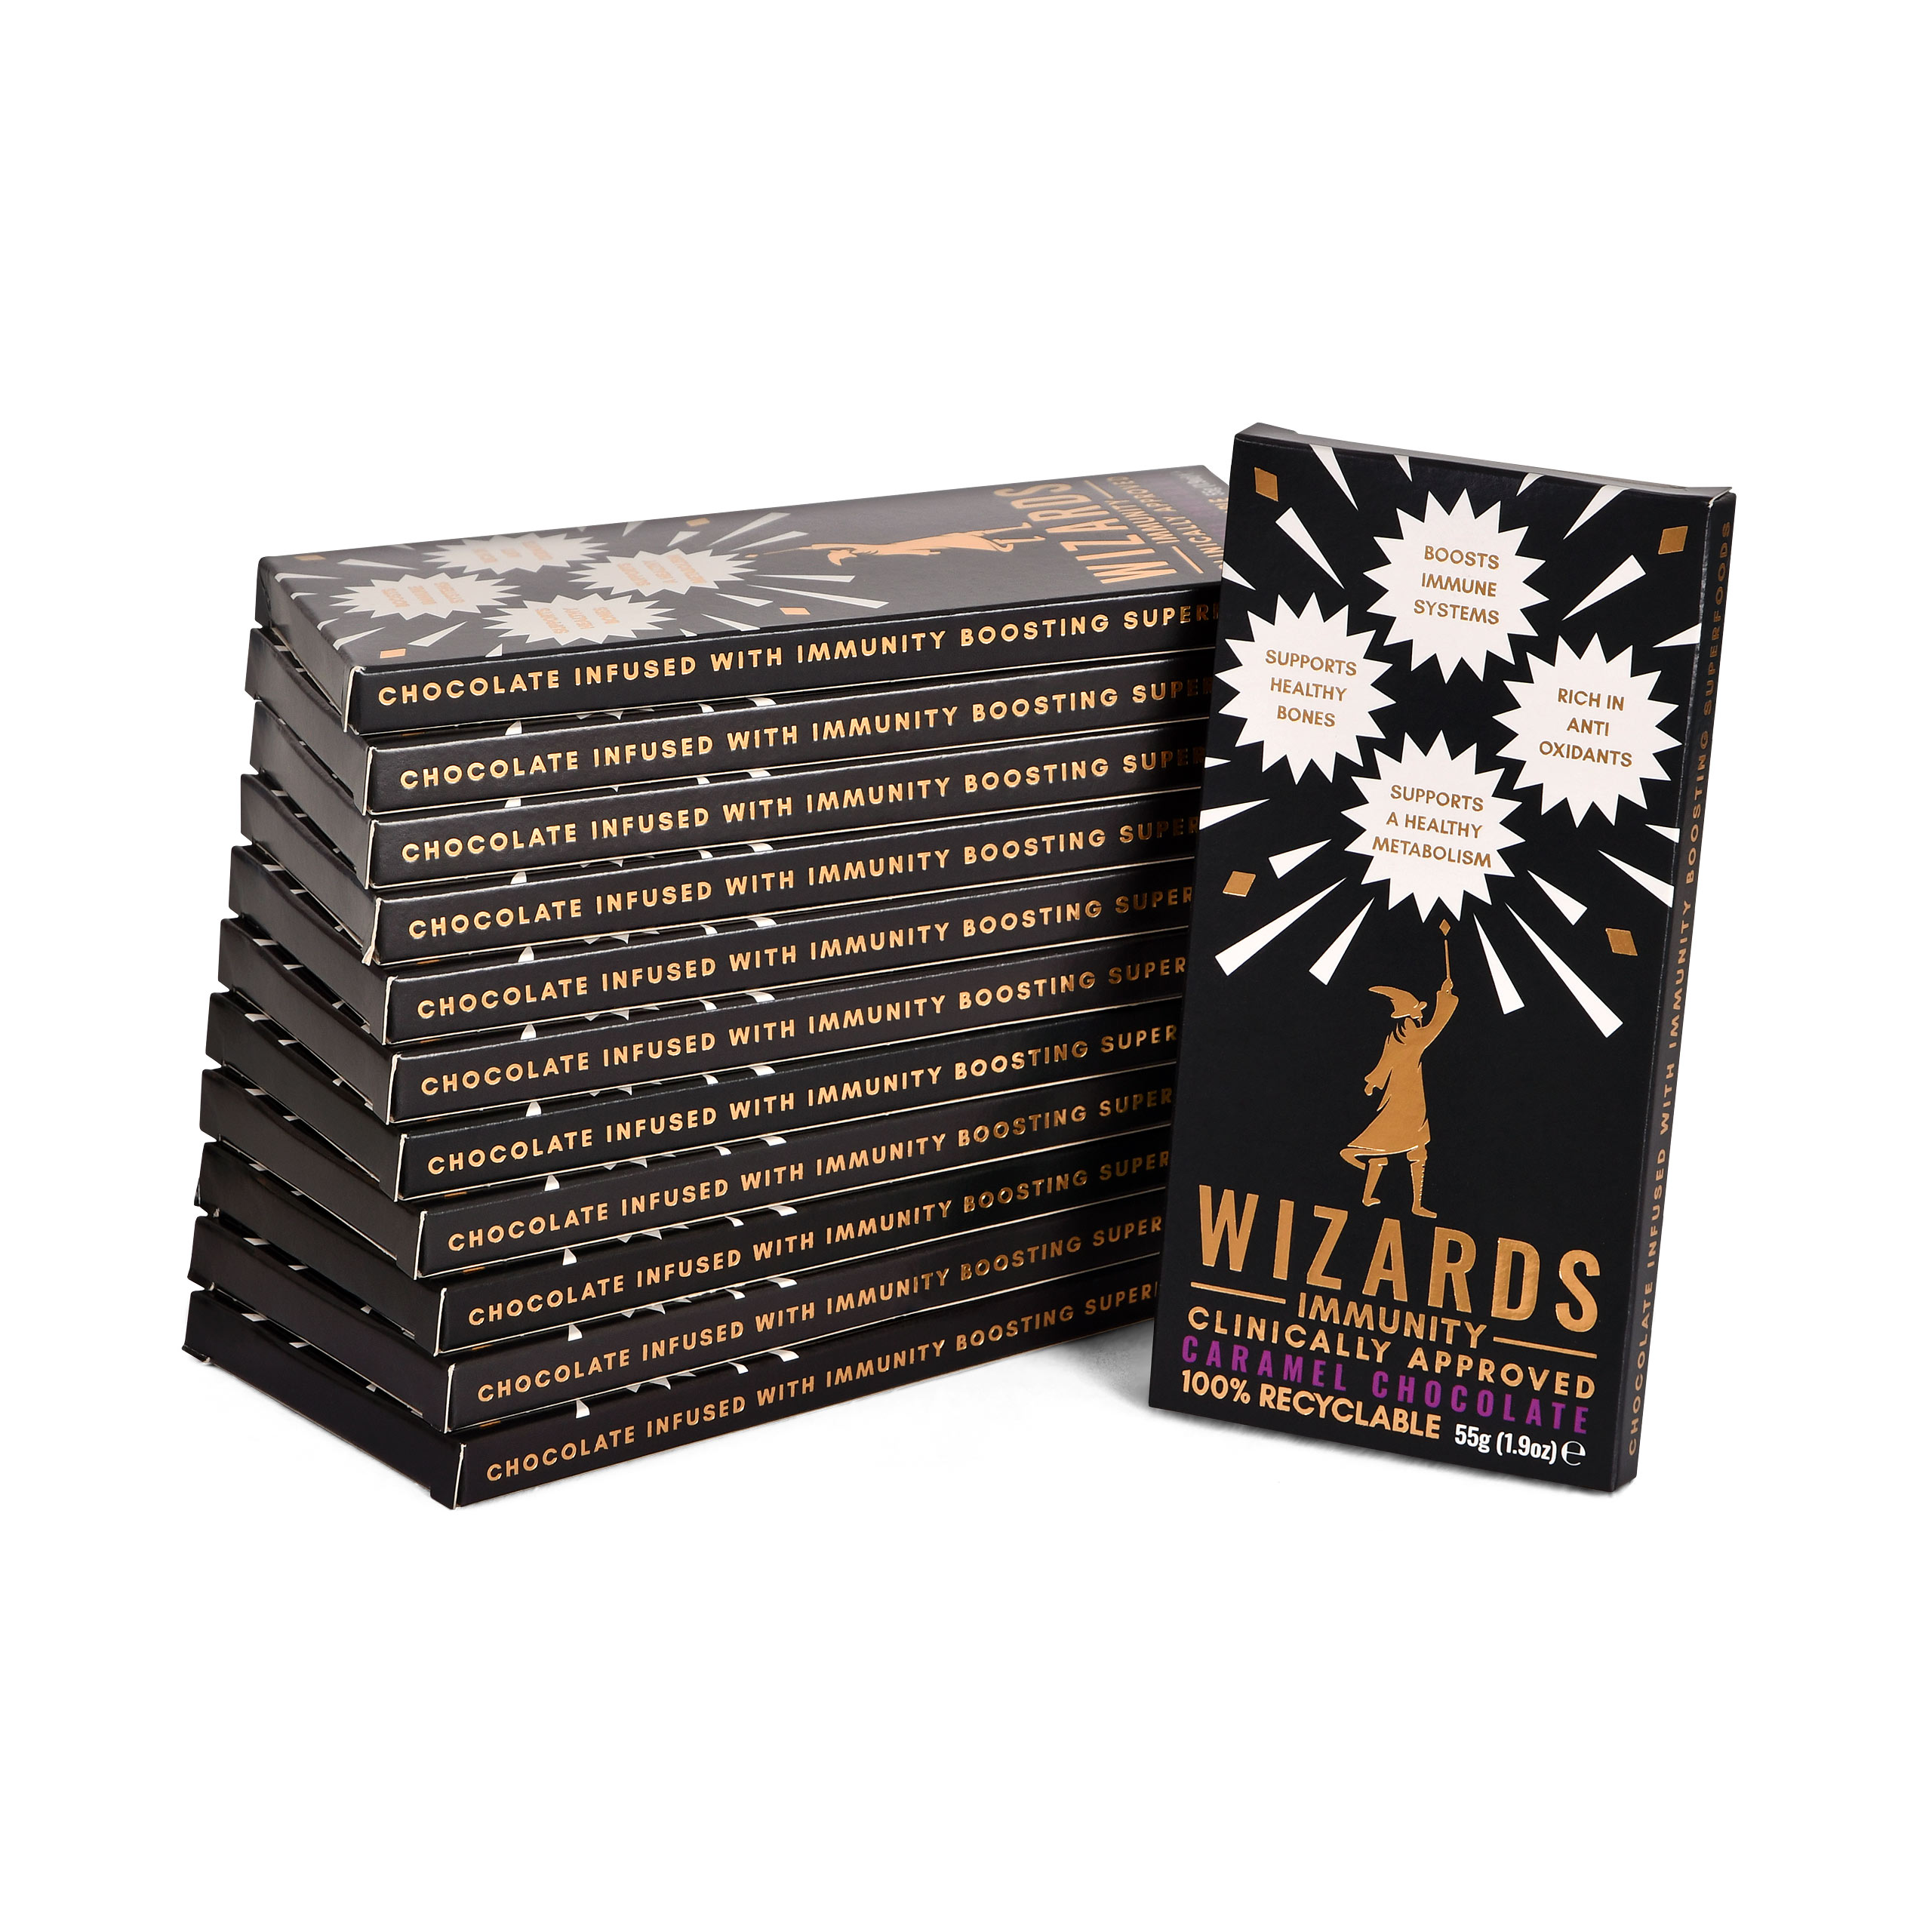 Wizards Magic - Immunity Karamell Schokolade 12 Tafeln